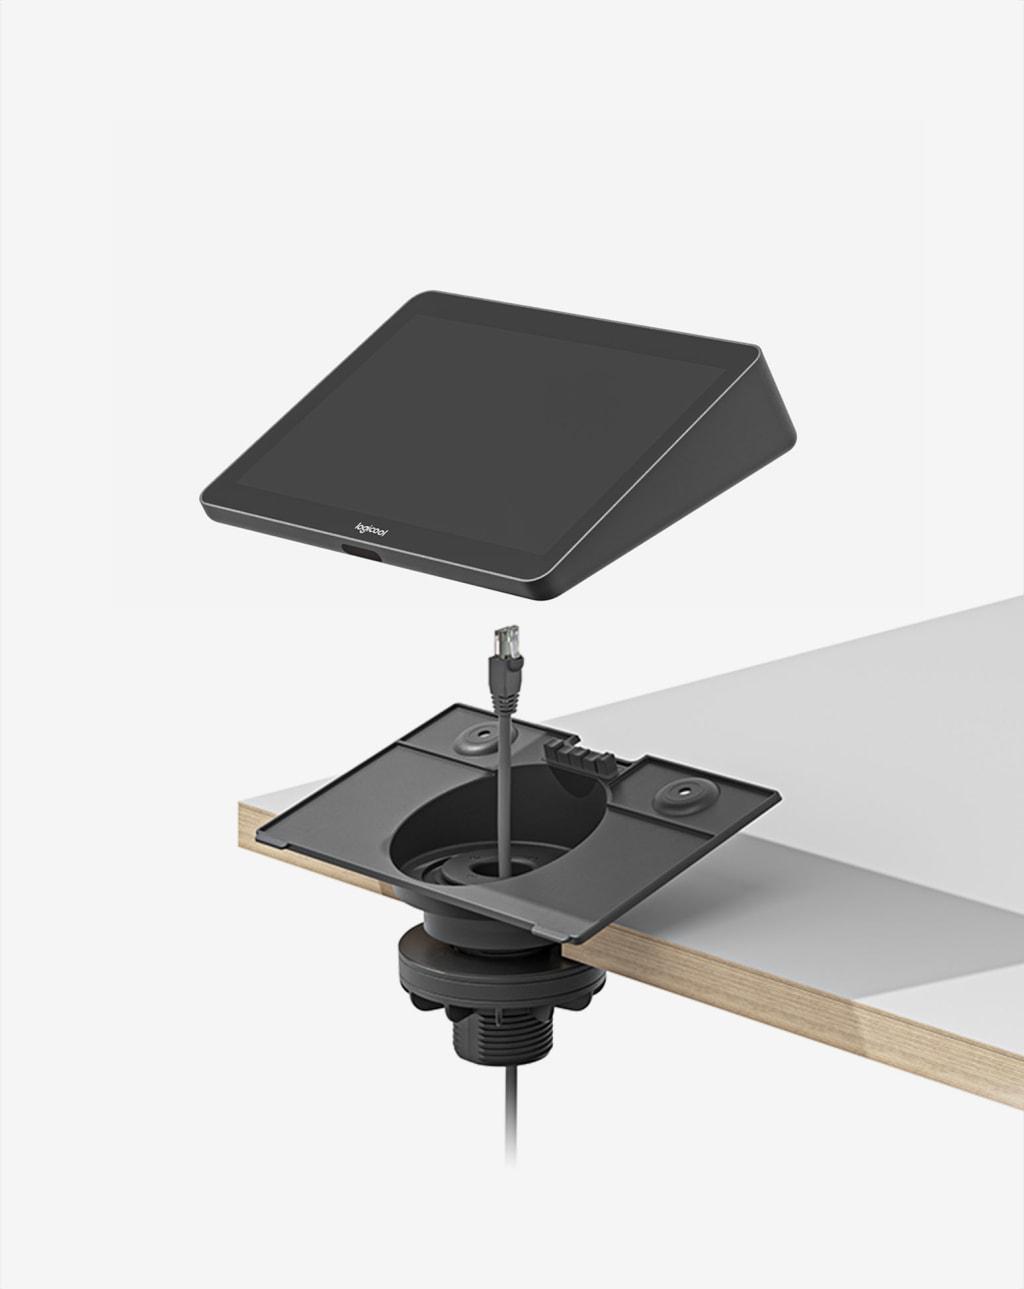 mounts-2-tablet